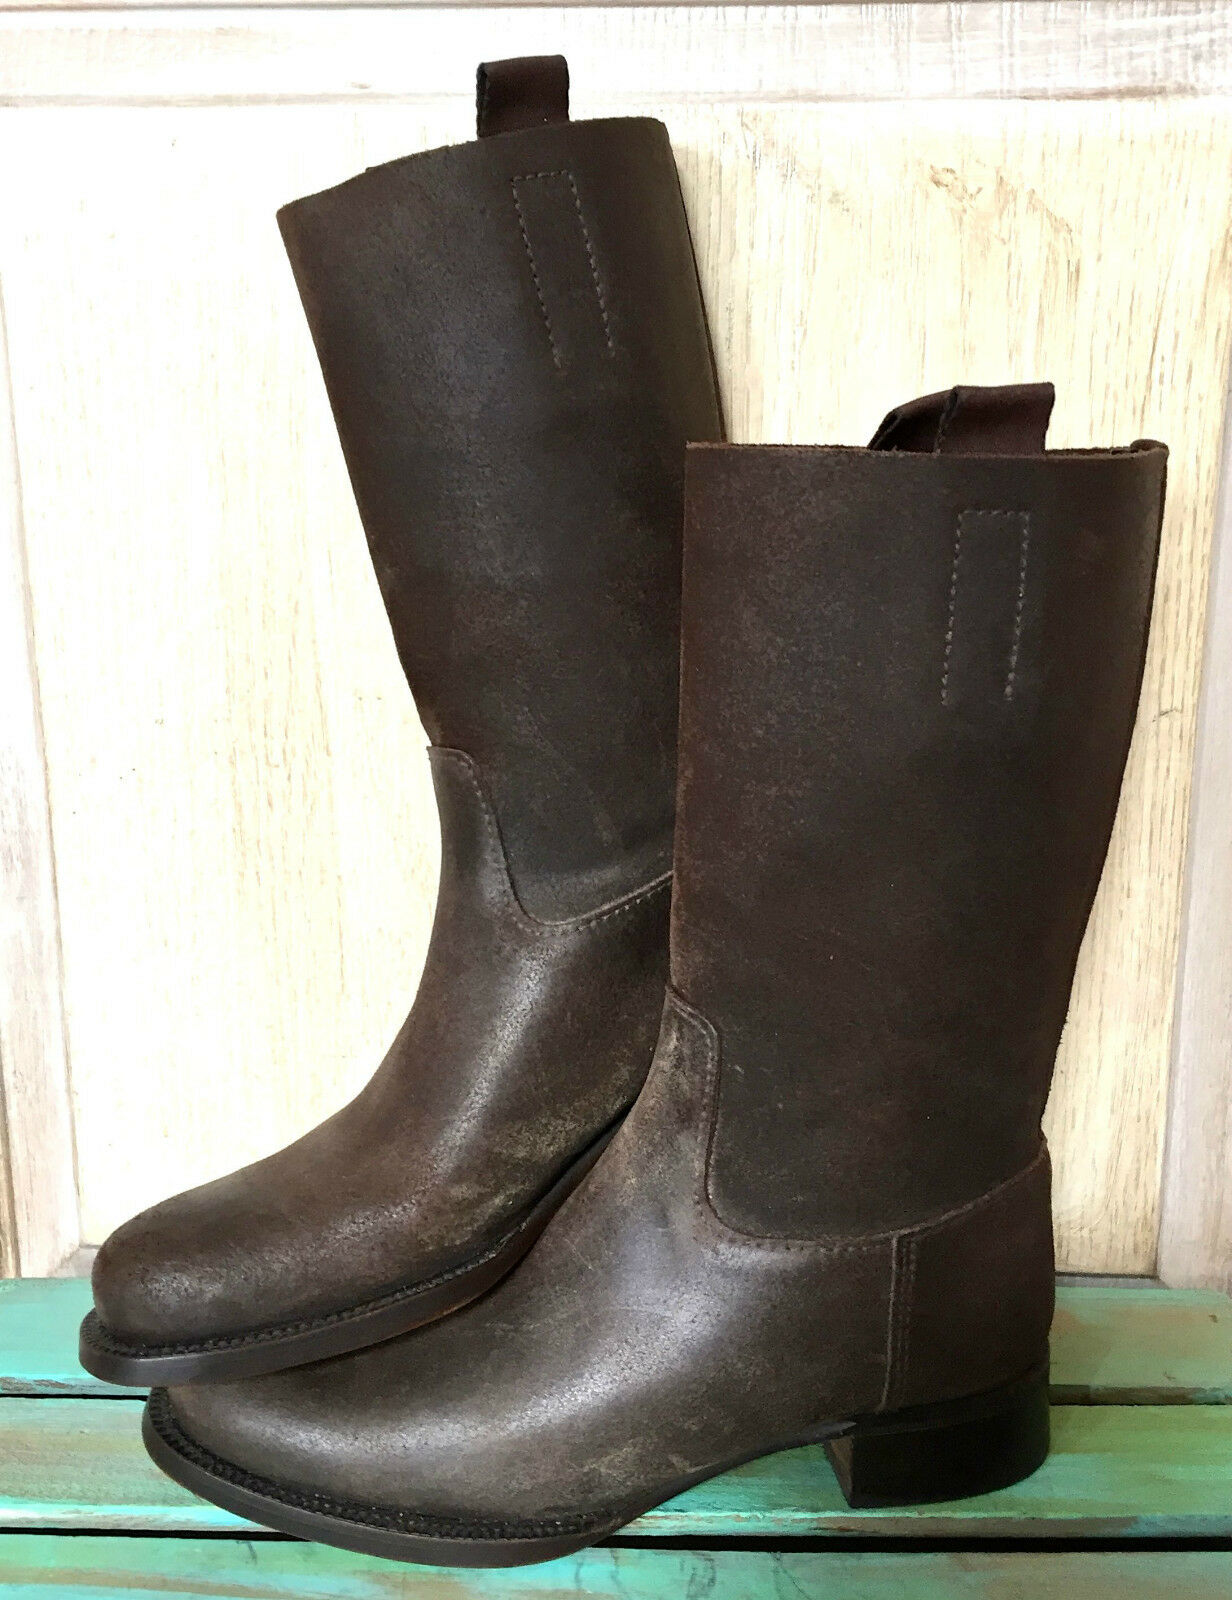 Prada brown Distress Leather Moto Riding Boots pull on tabs EUC 38.5